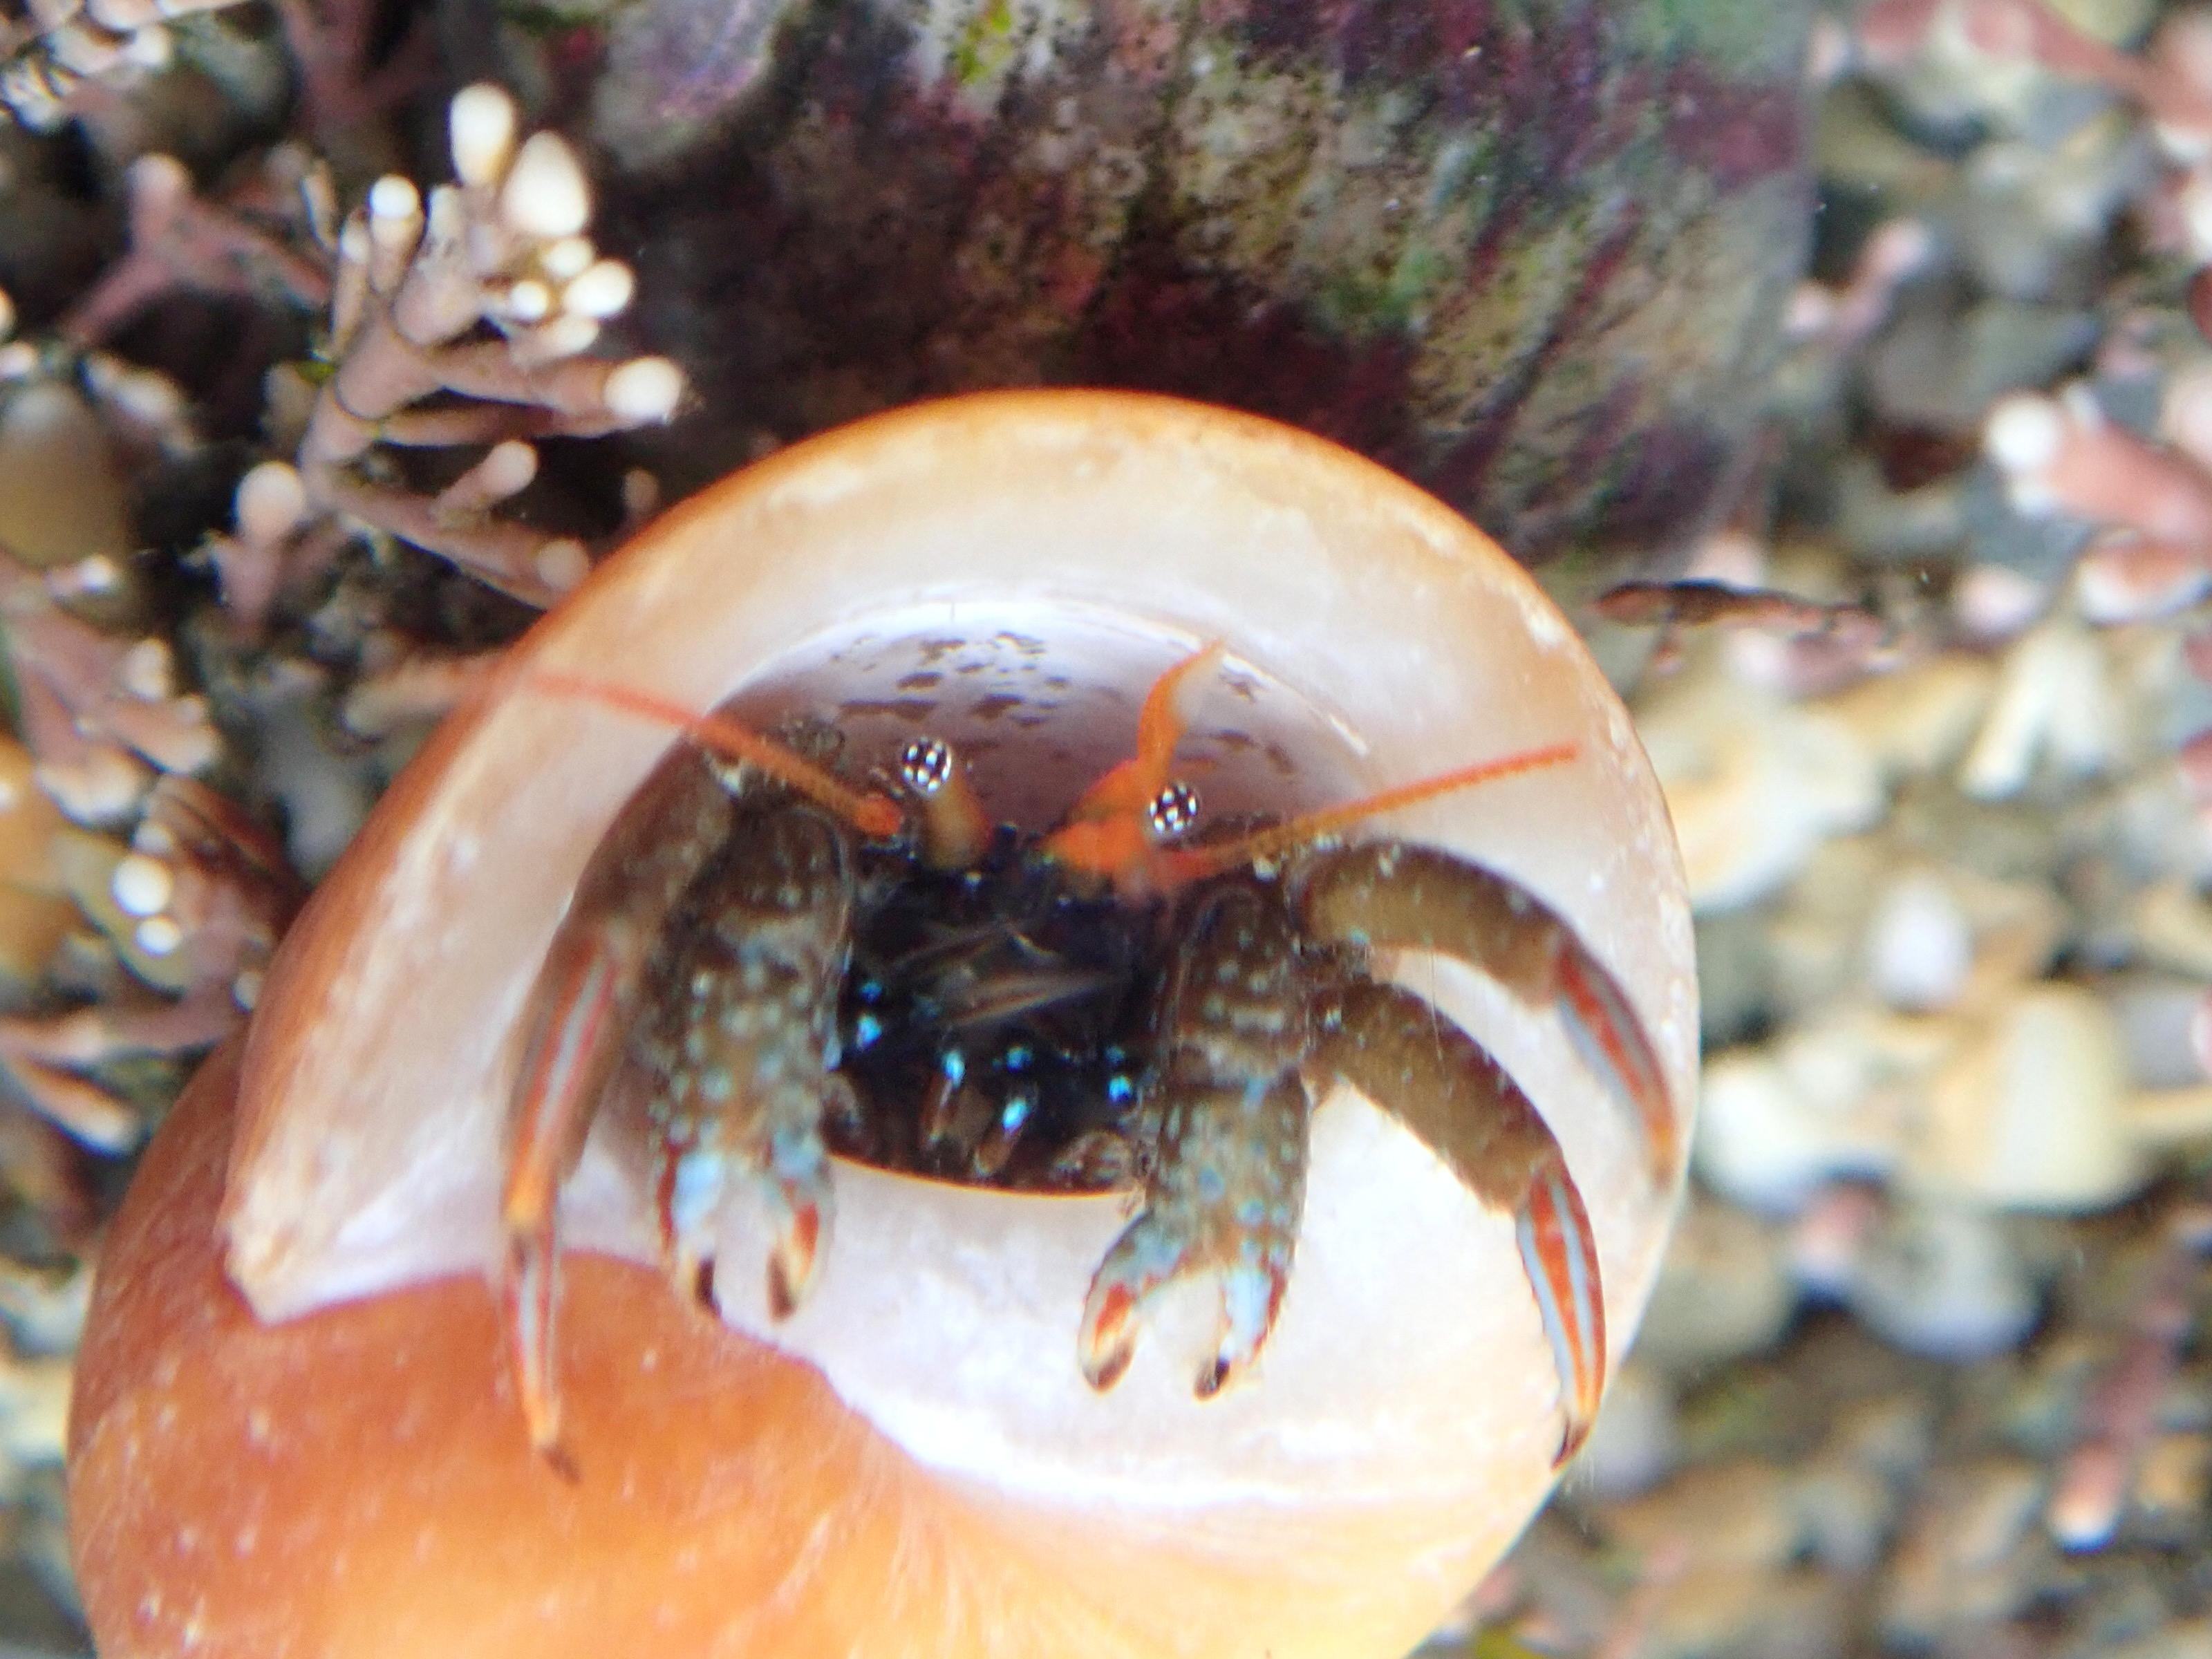 St Piran's Hermit Crab (Clibanarius erythropus) showing its equal-sized claws